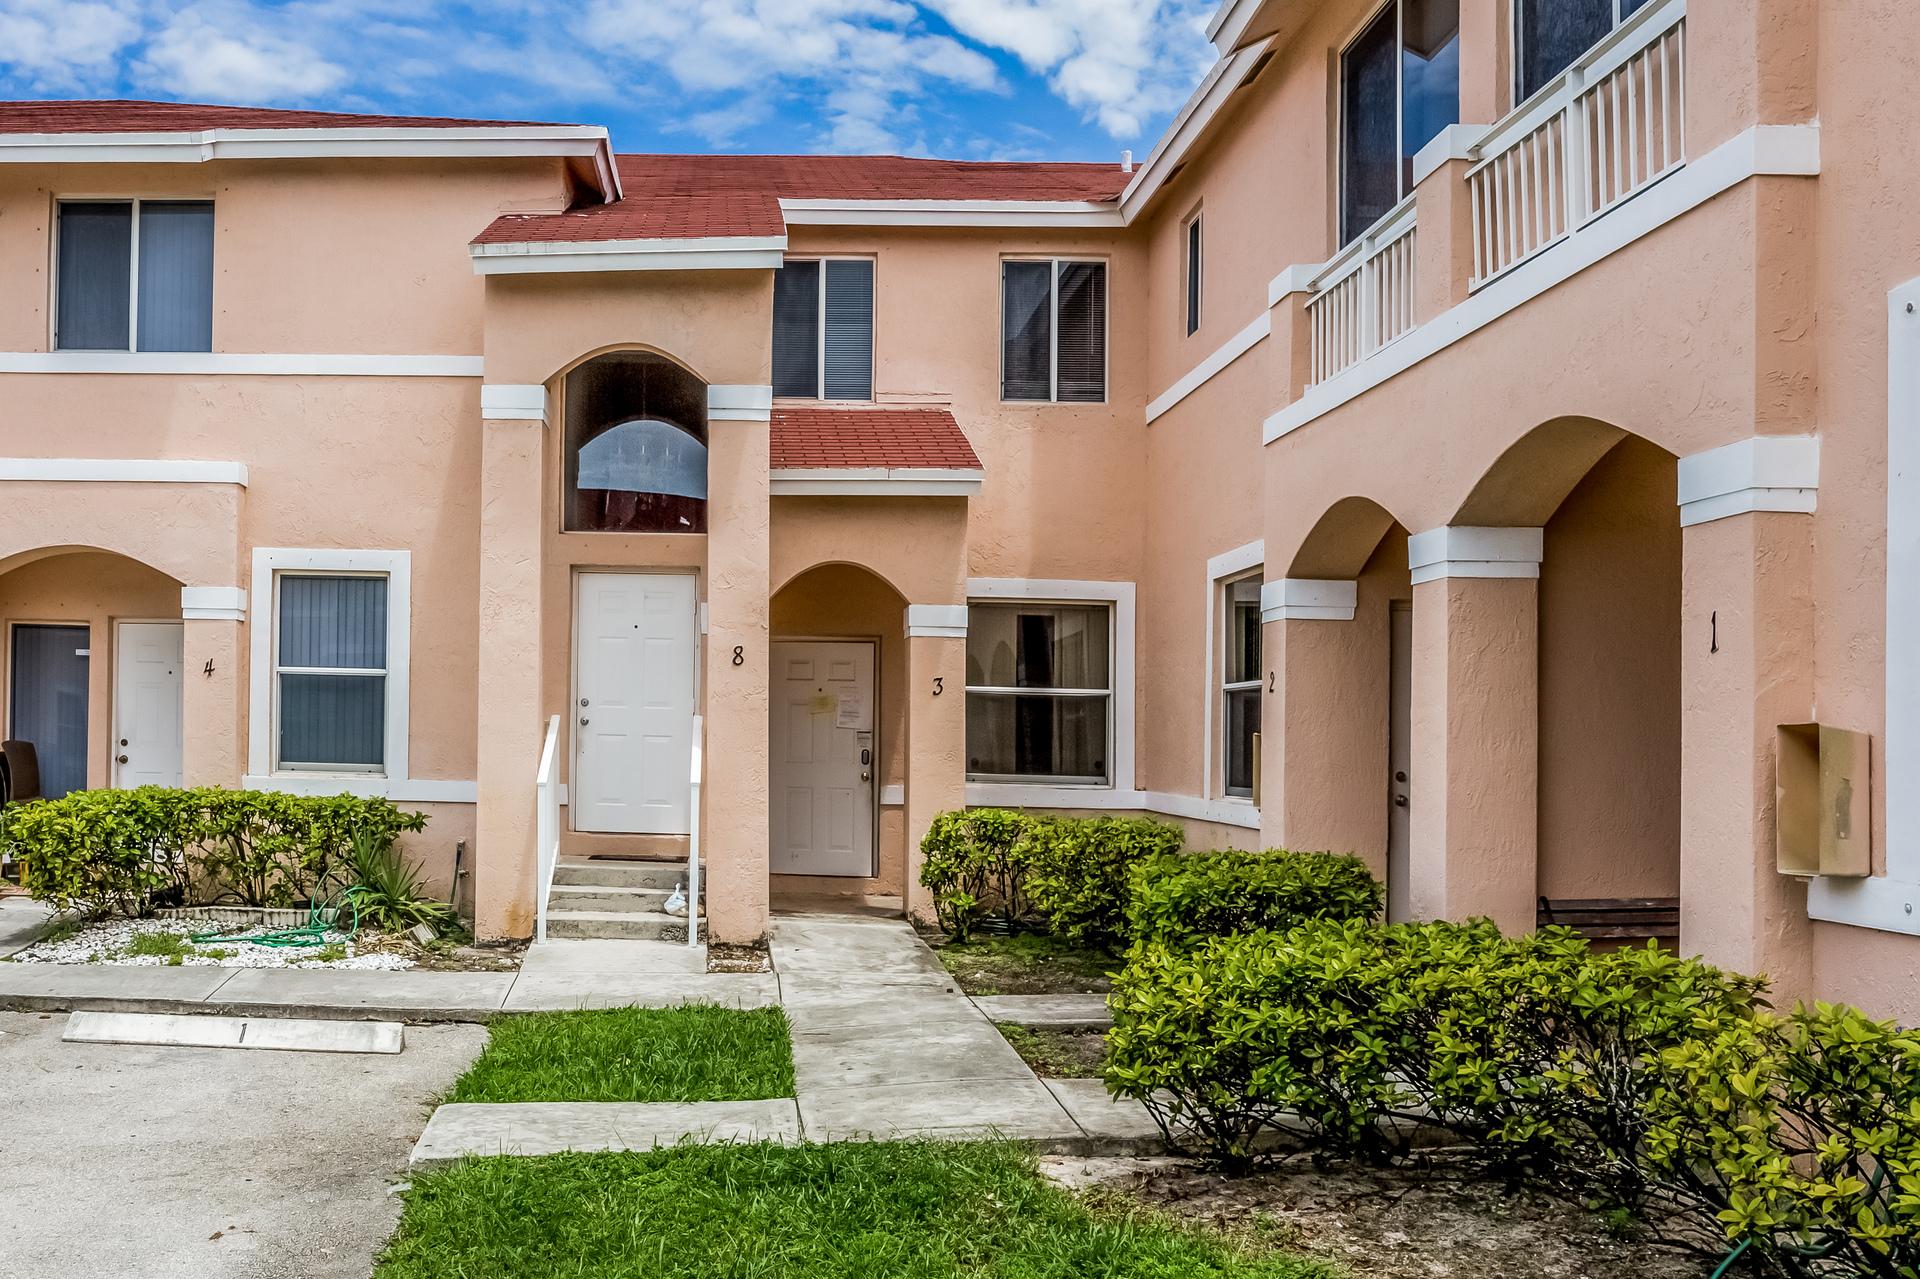 21255 NE 8th Pl, Miami, FL 33179